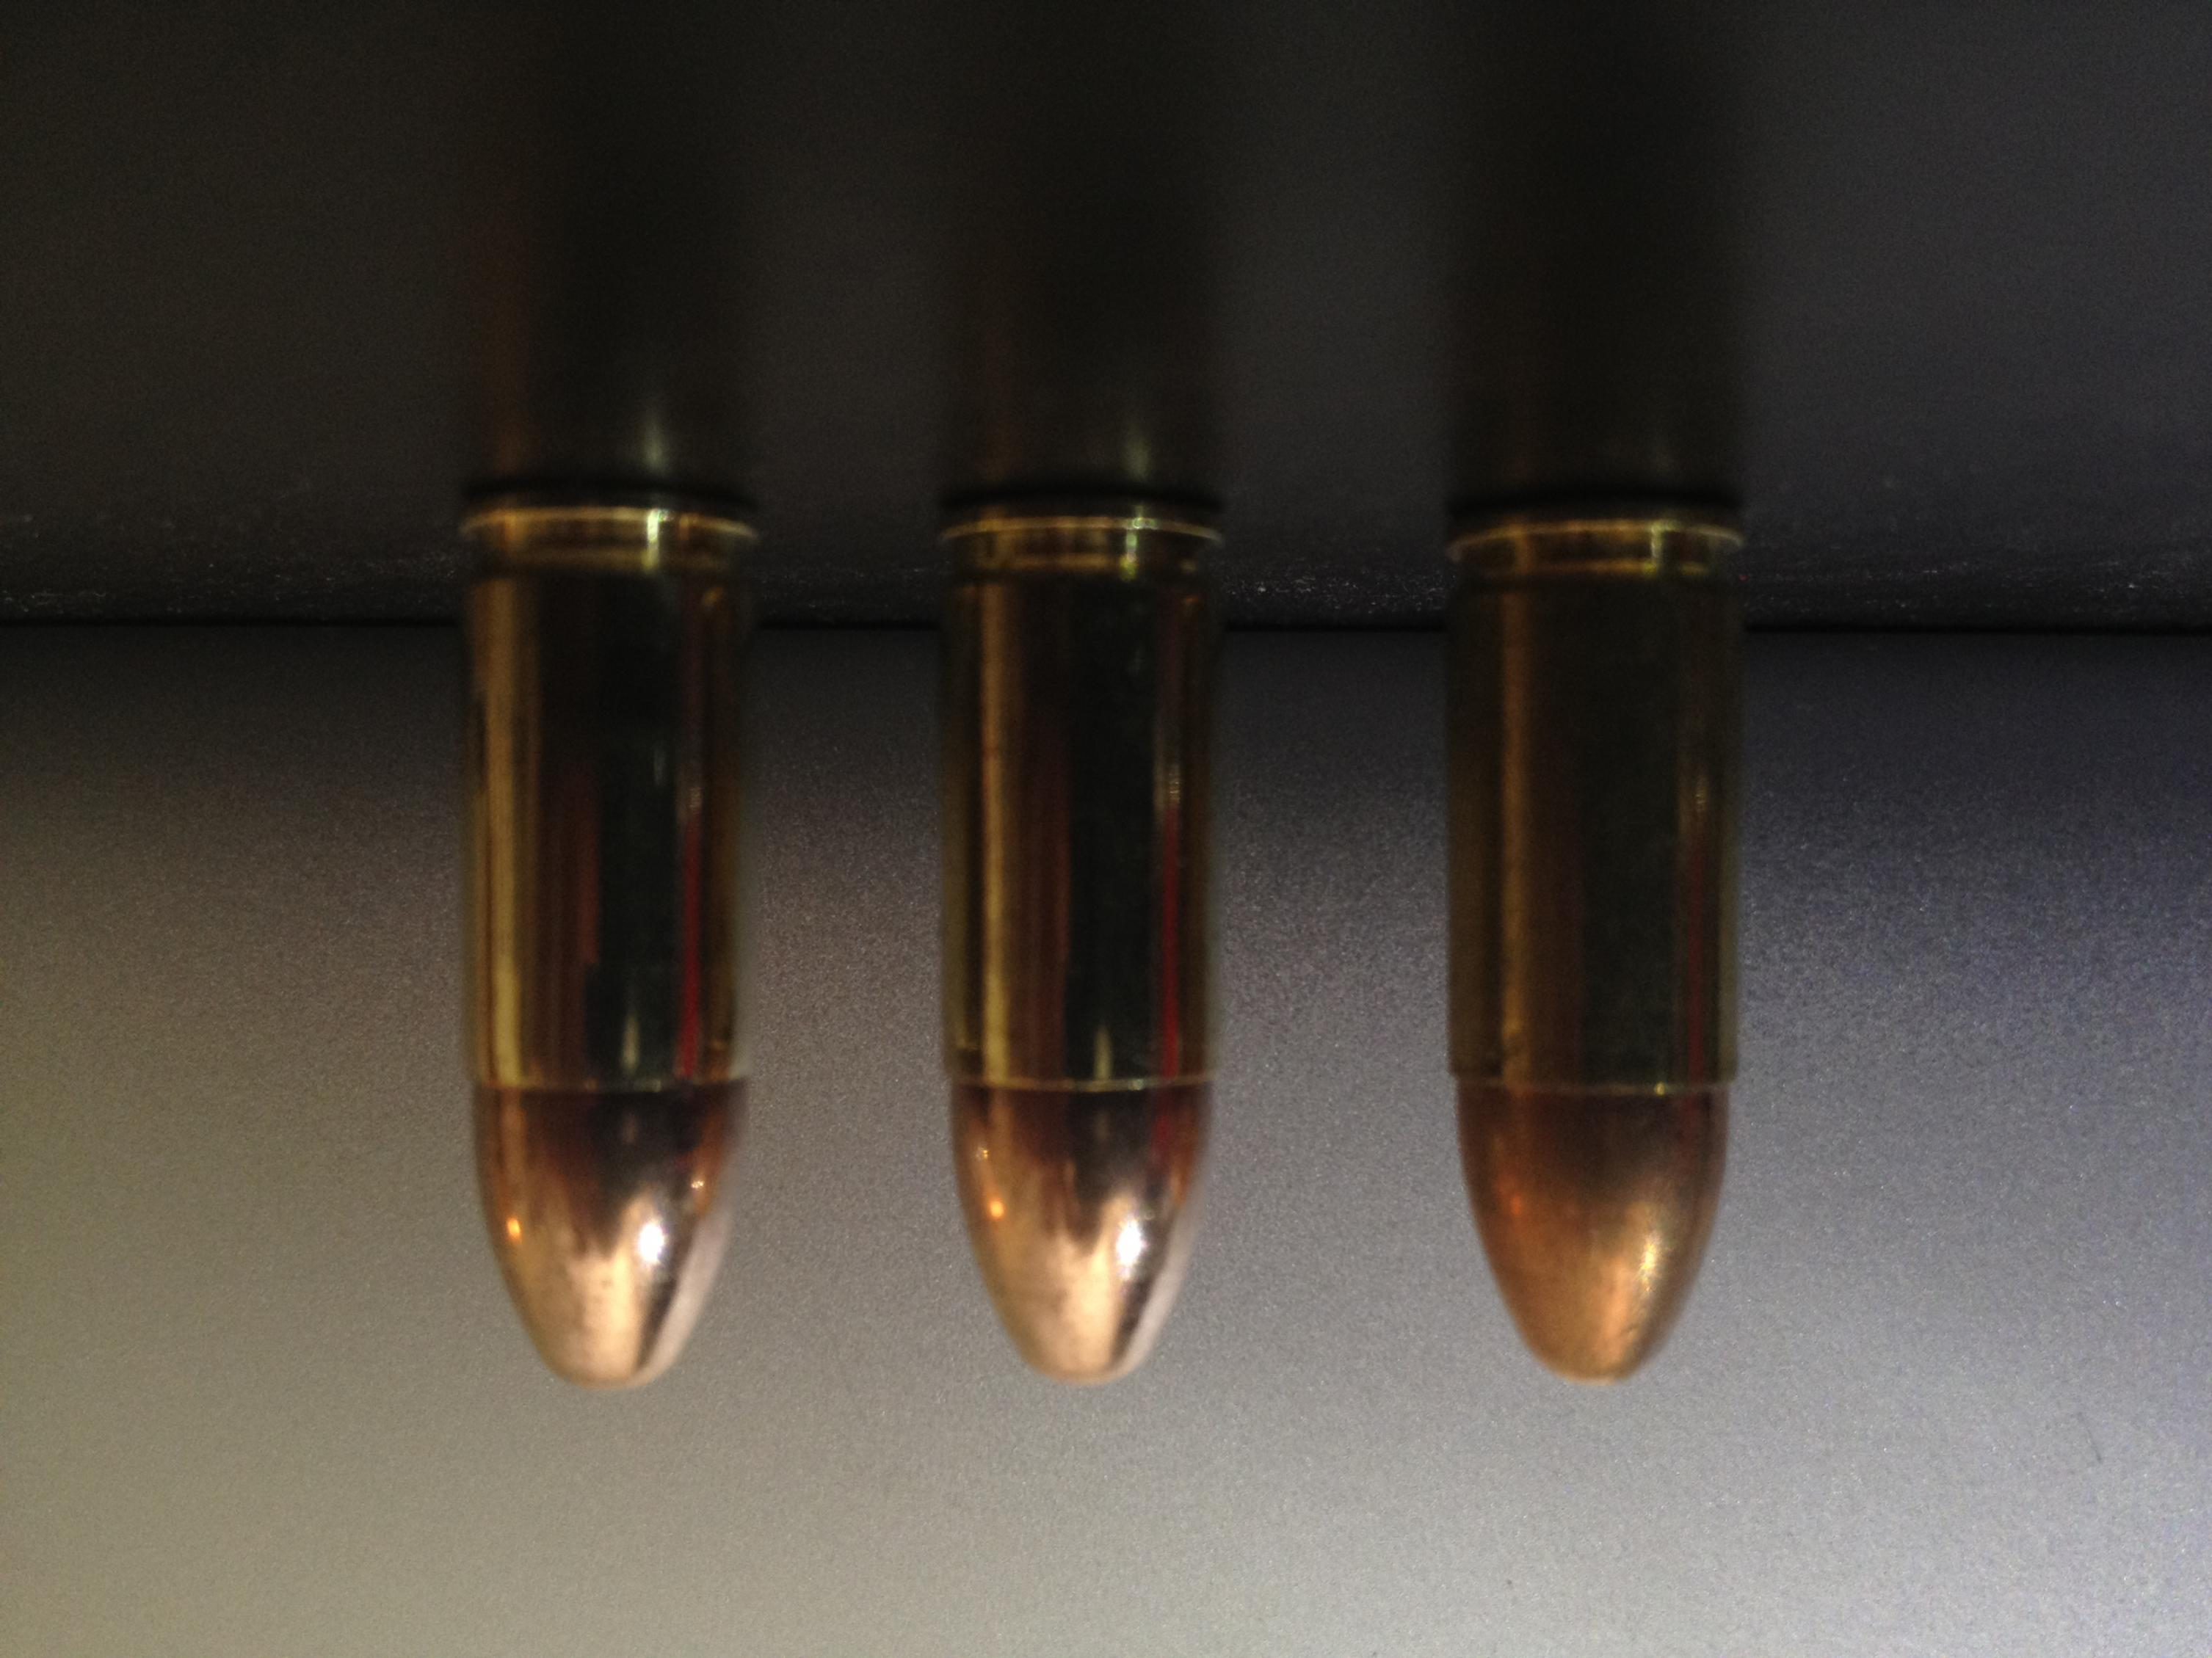 9mm Winchester NATO in 115 grain 100 Round value pack?-img_0640.jpg